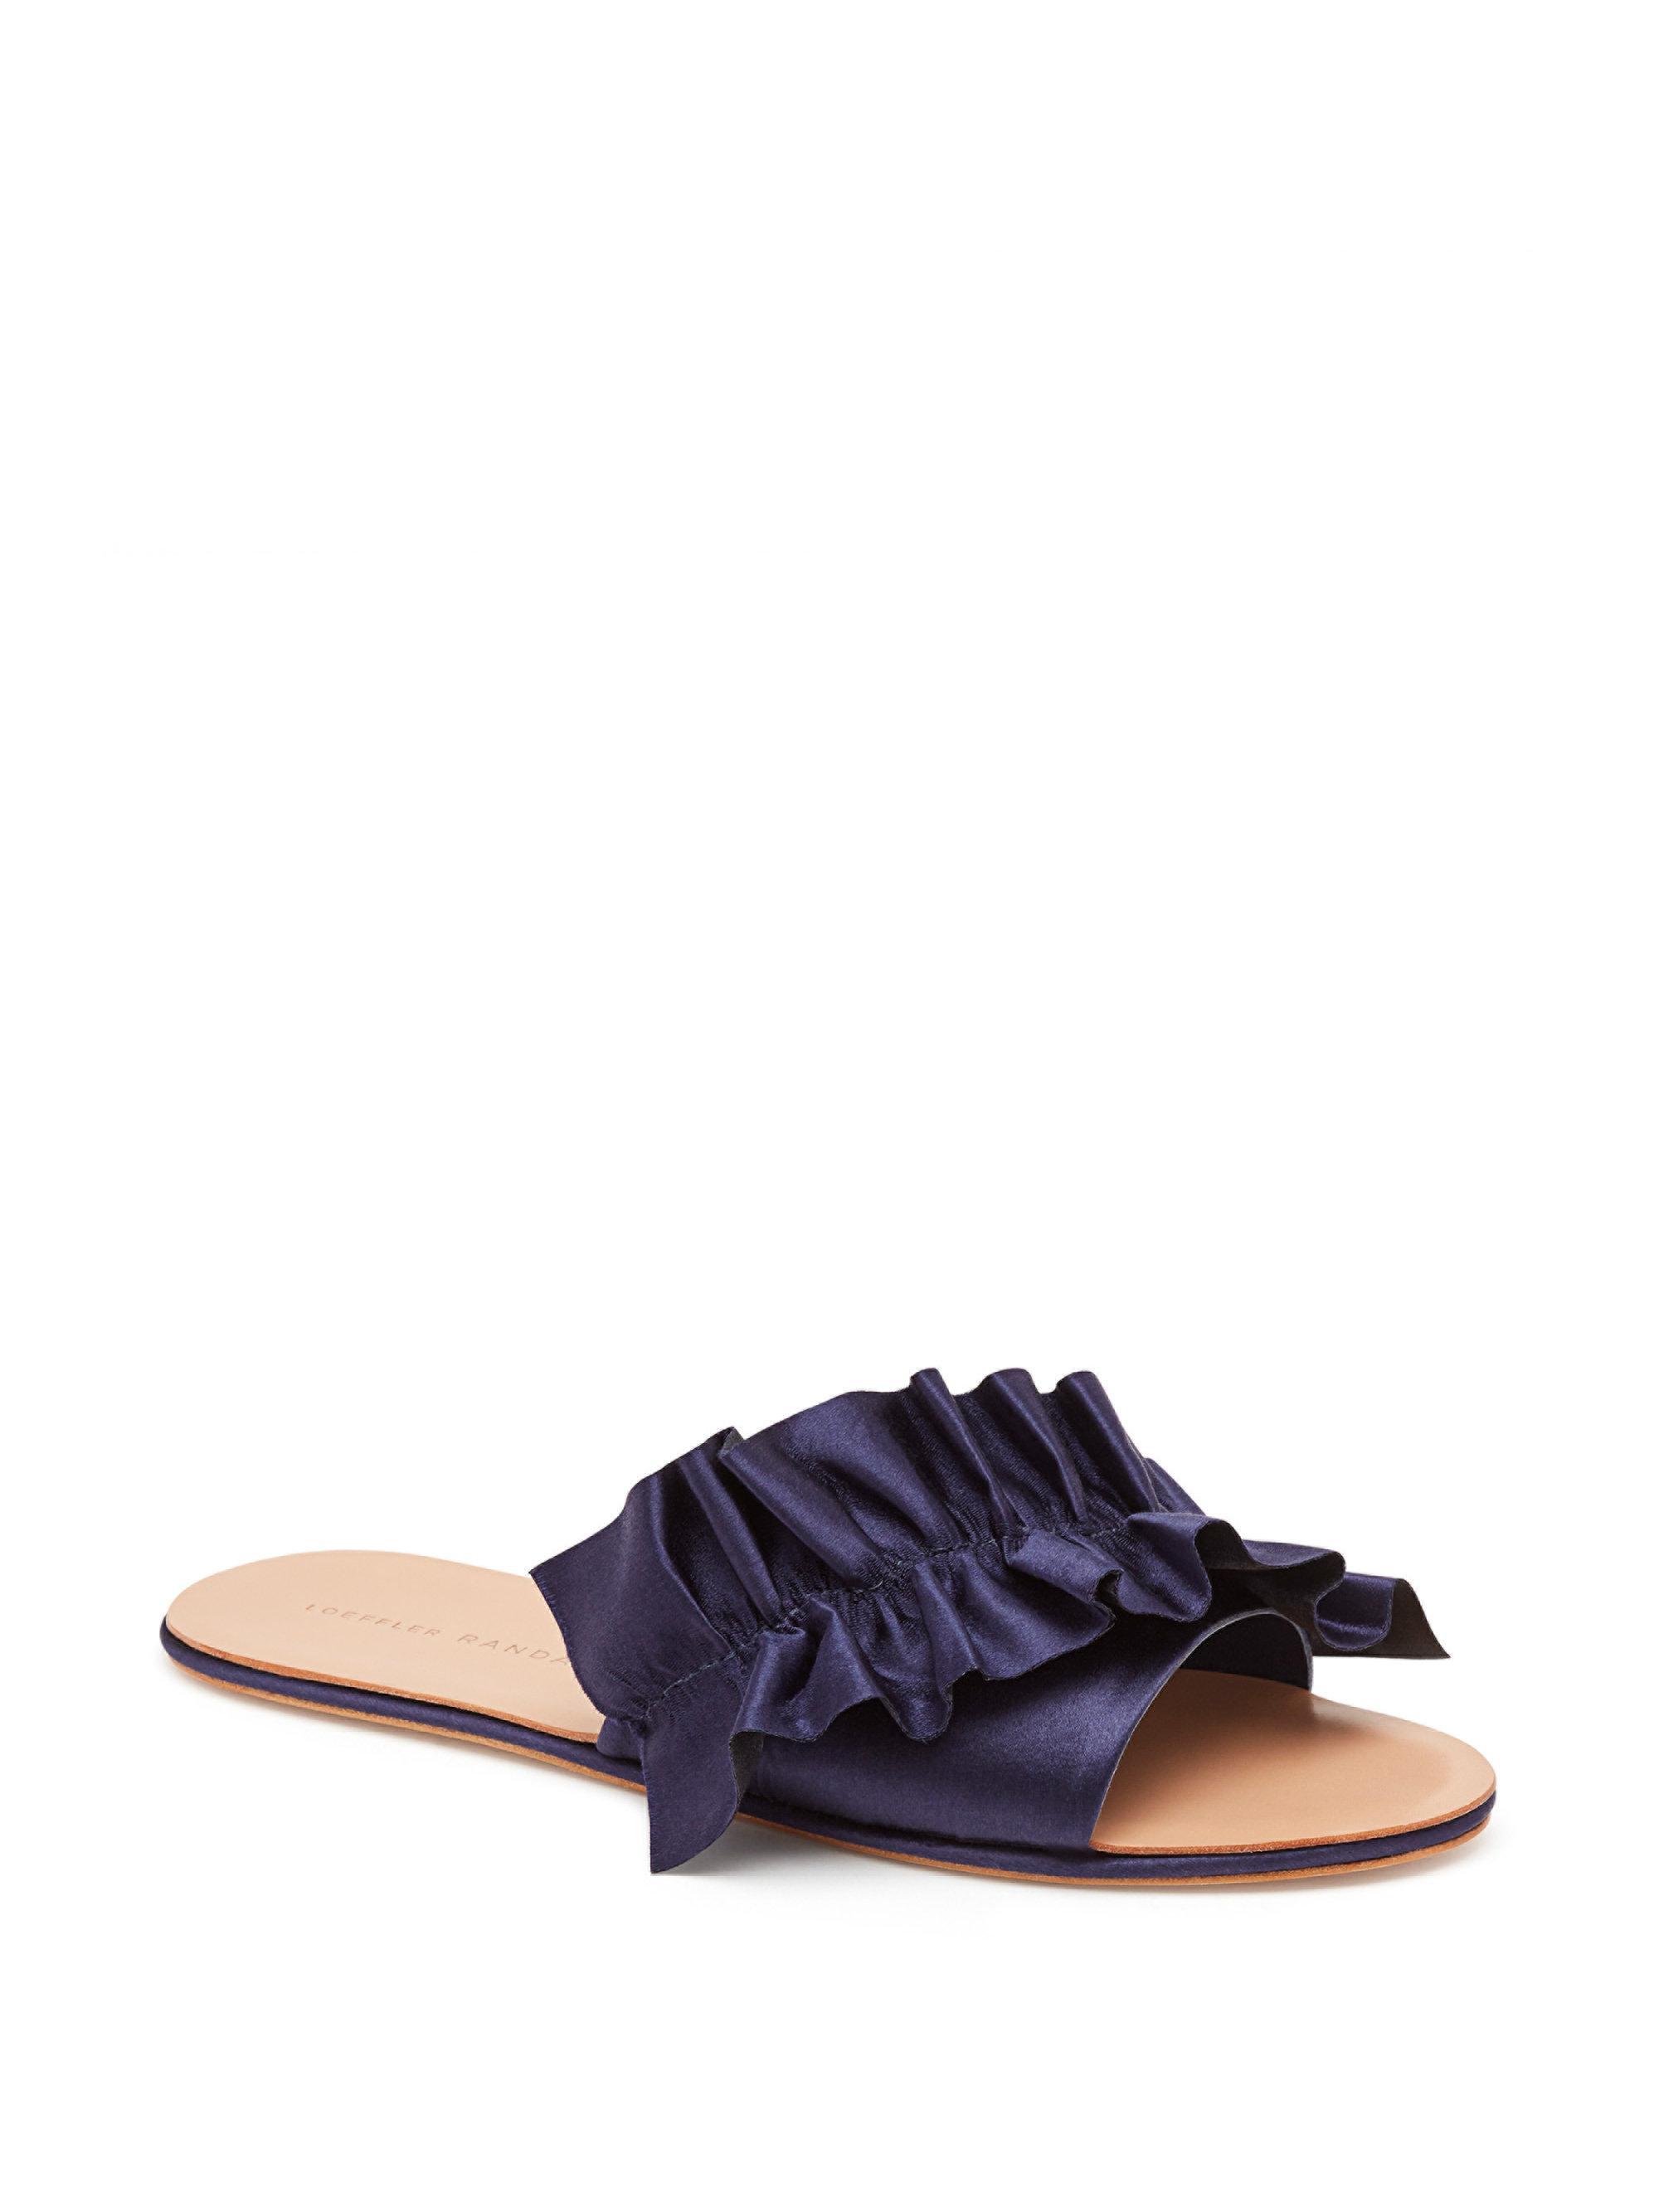 Loeffler Randall Rey Satin Ruffle Flat Sandal BhvaYgE